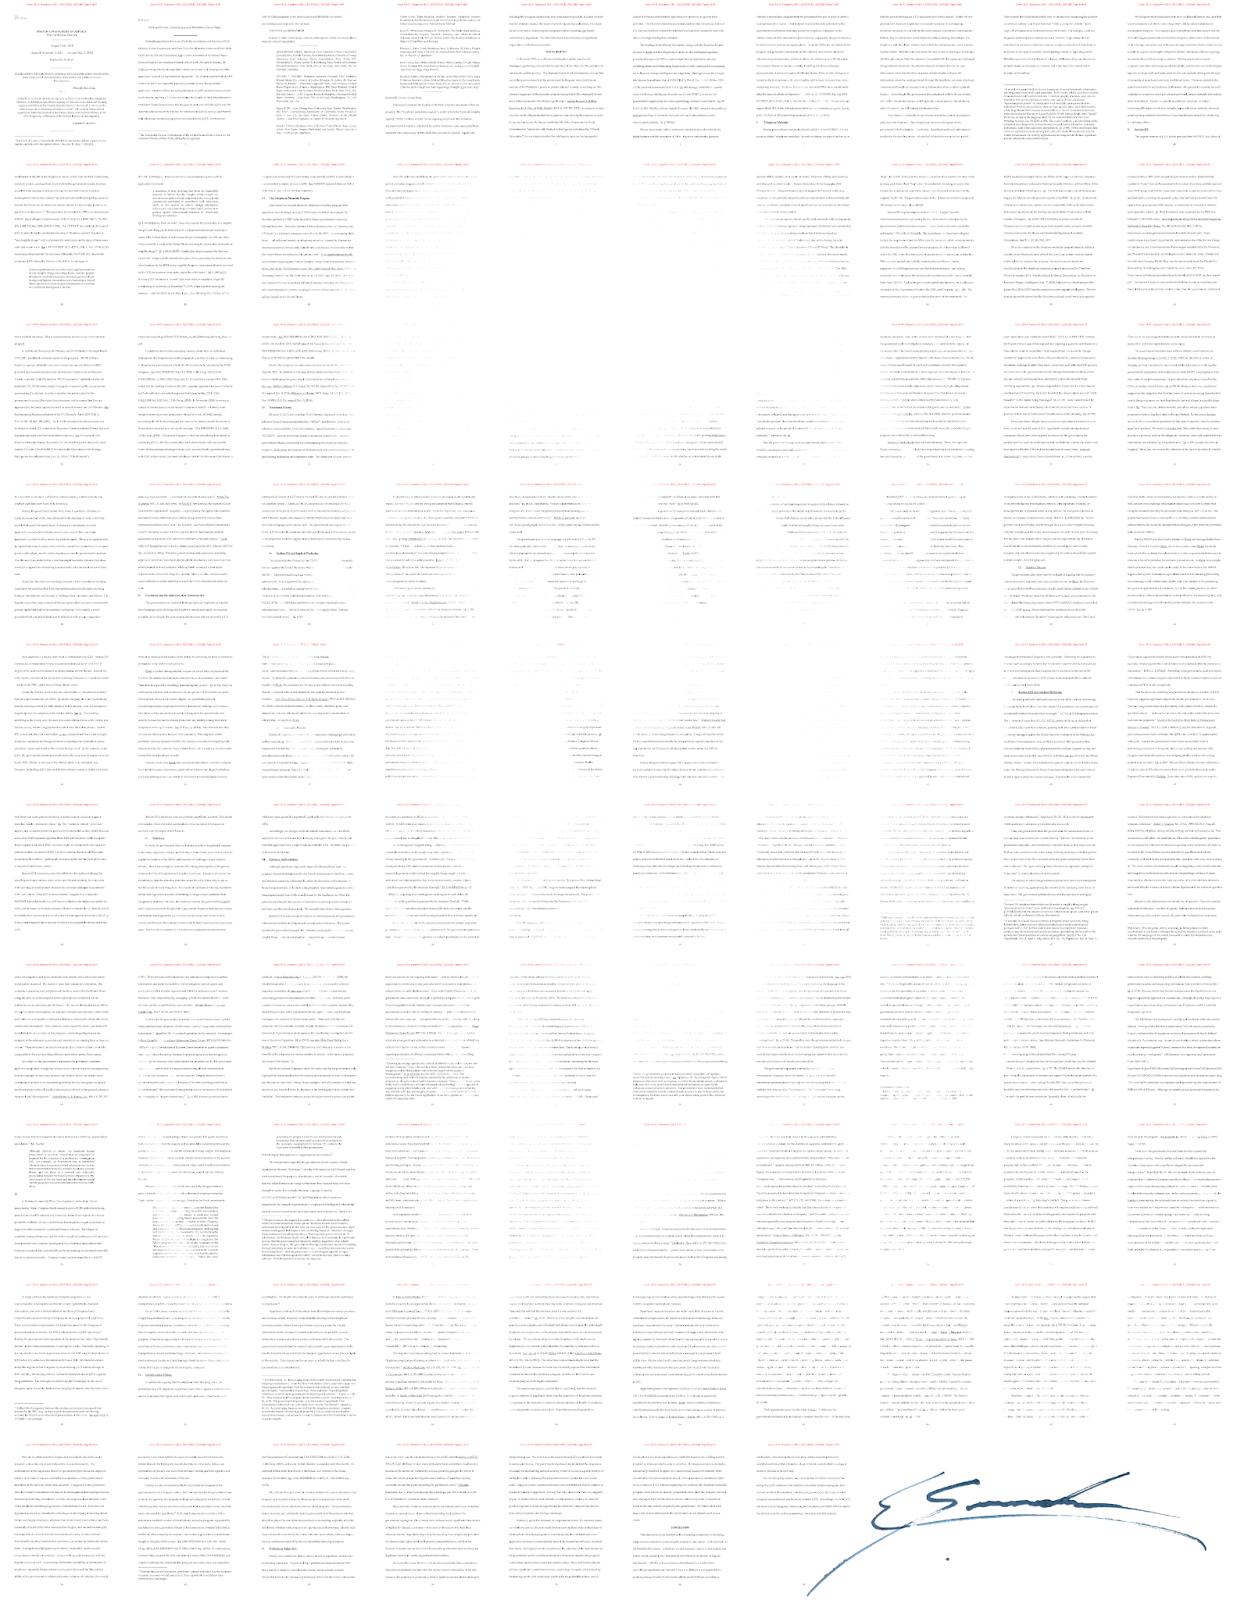 Obra de arte de Snowden